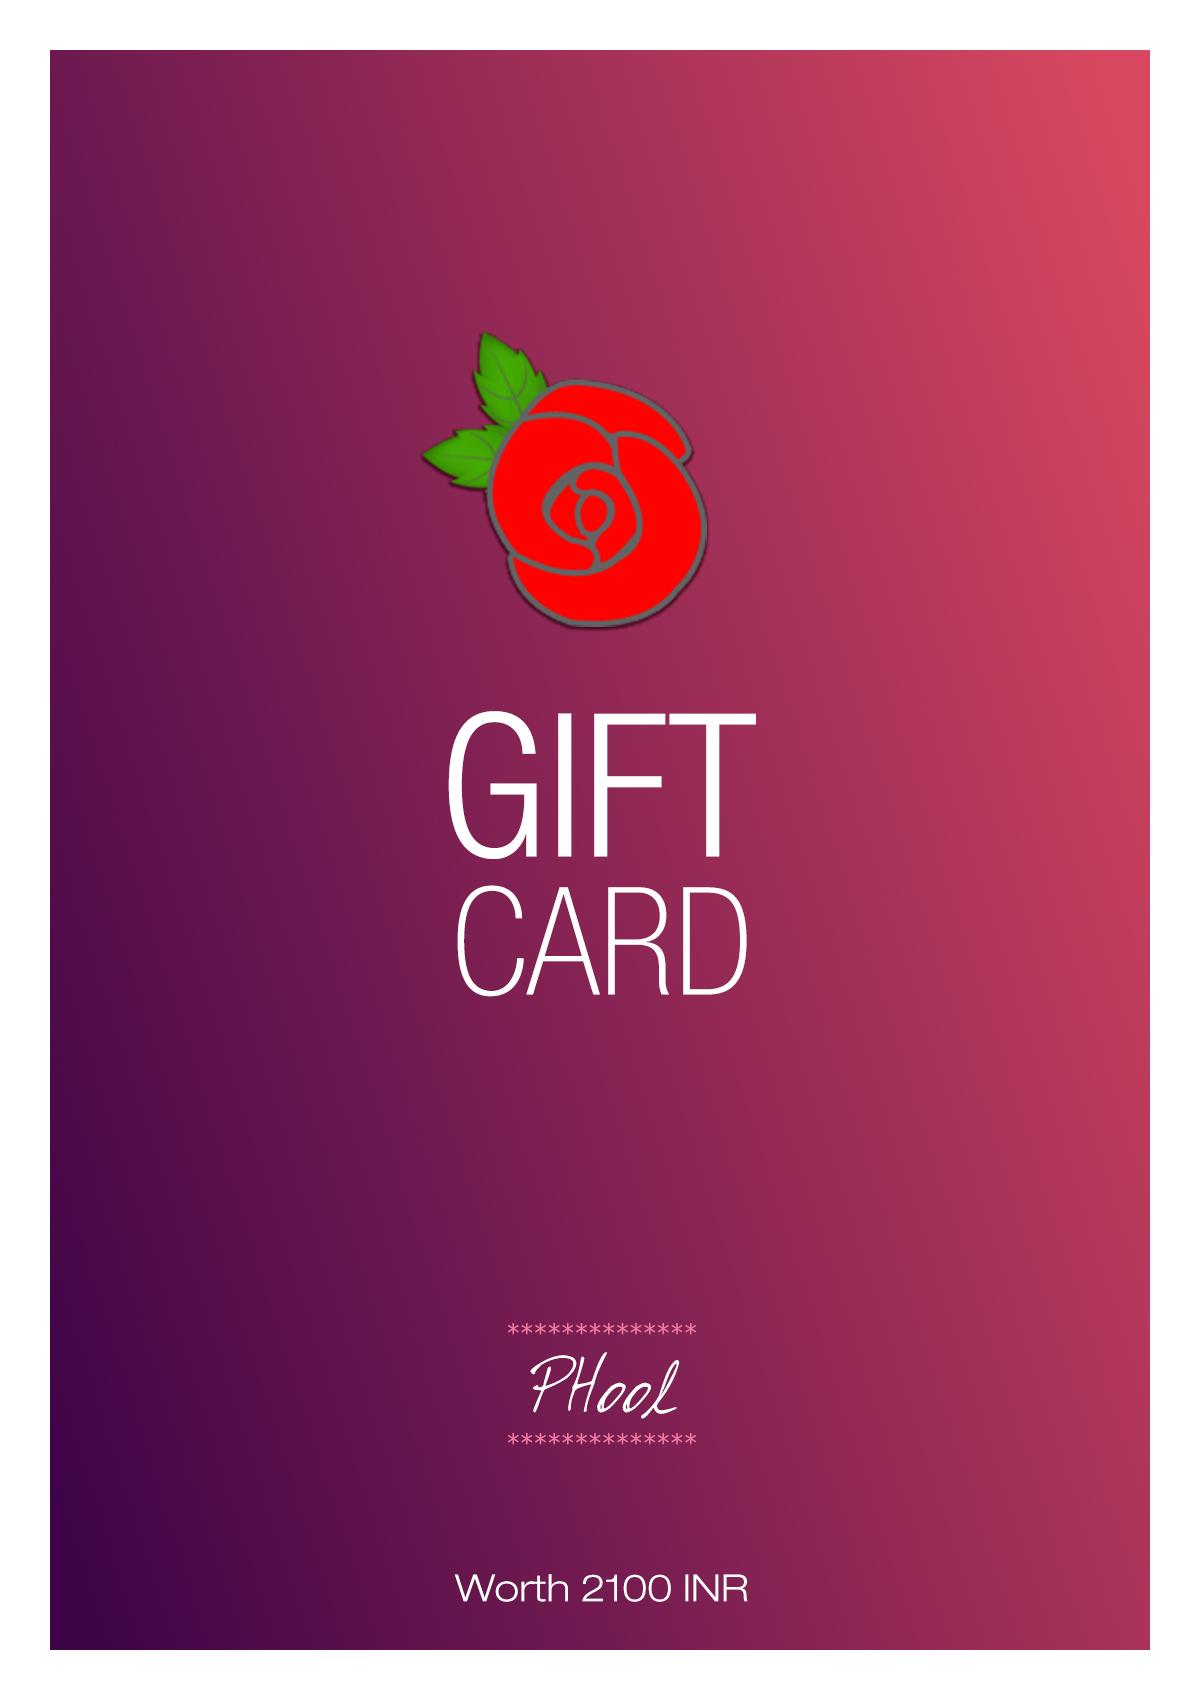 Phool Gift Card